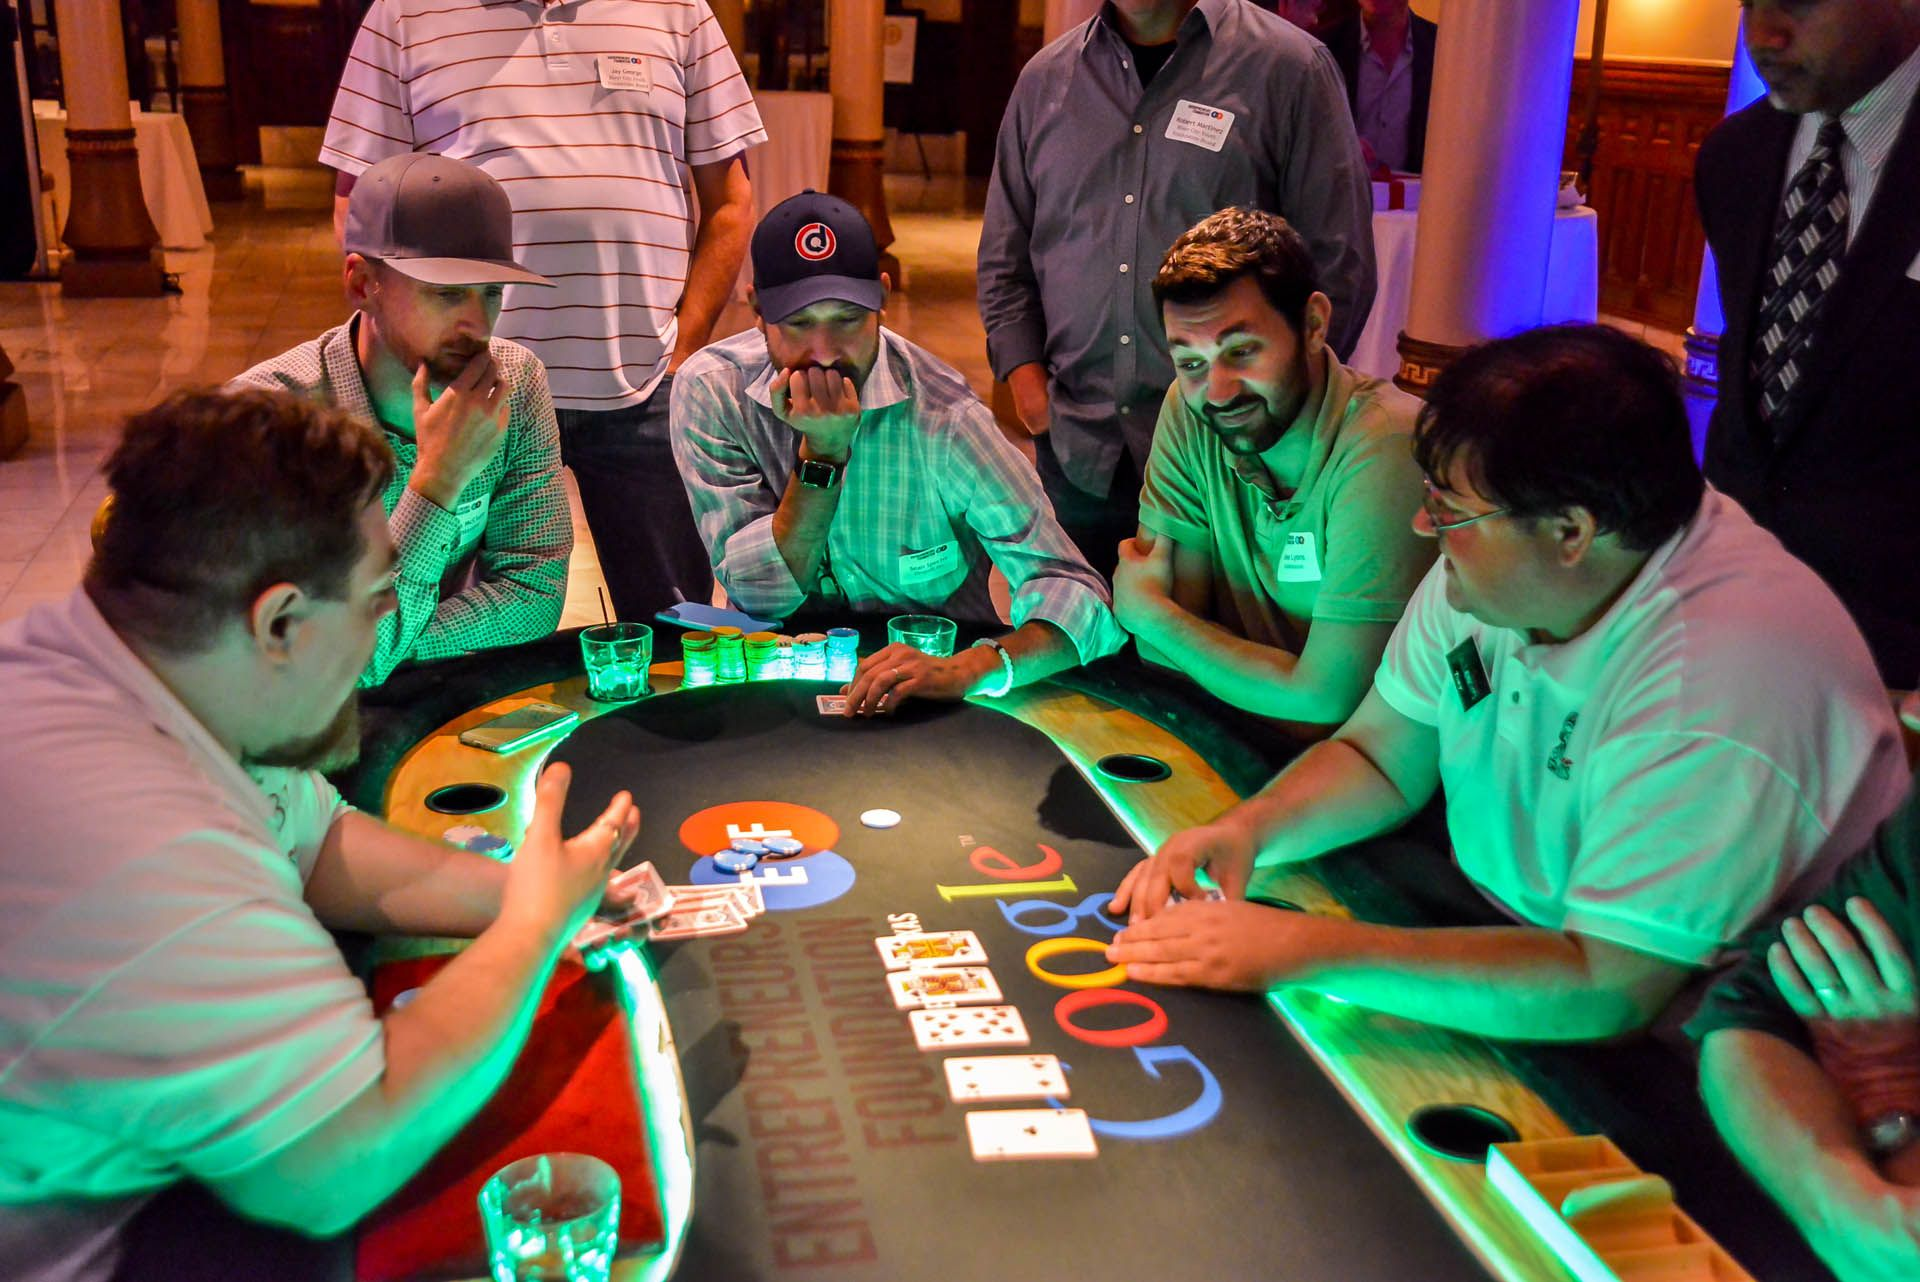 12th Annual Texas Hold 'Em Poker Tournament